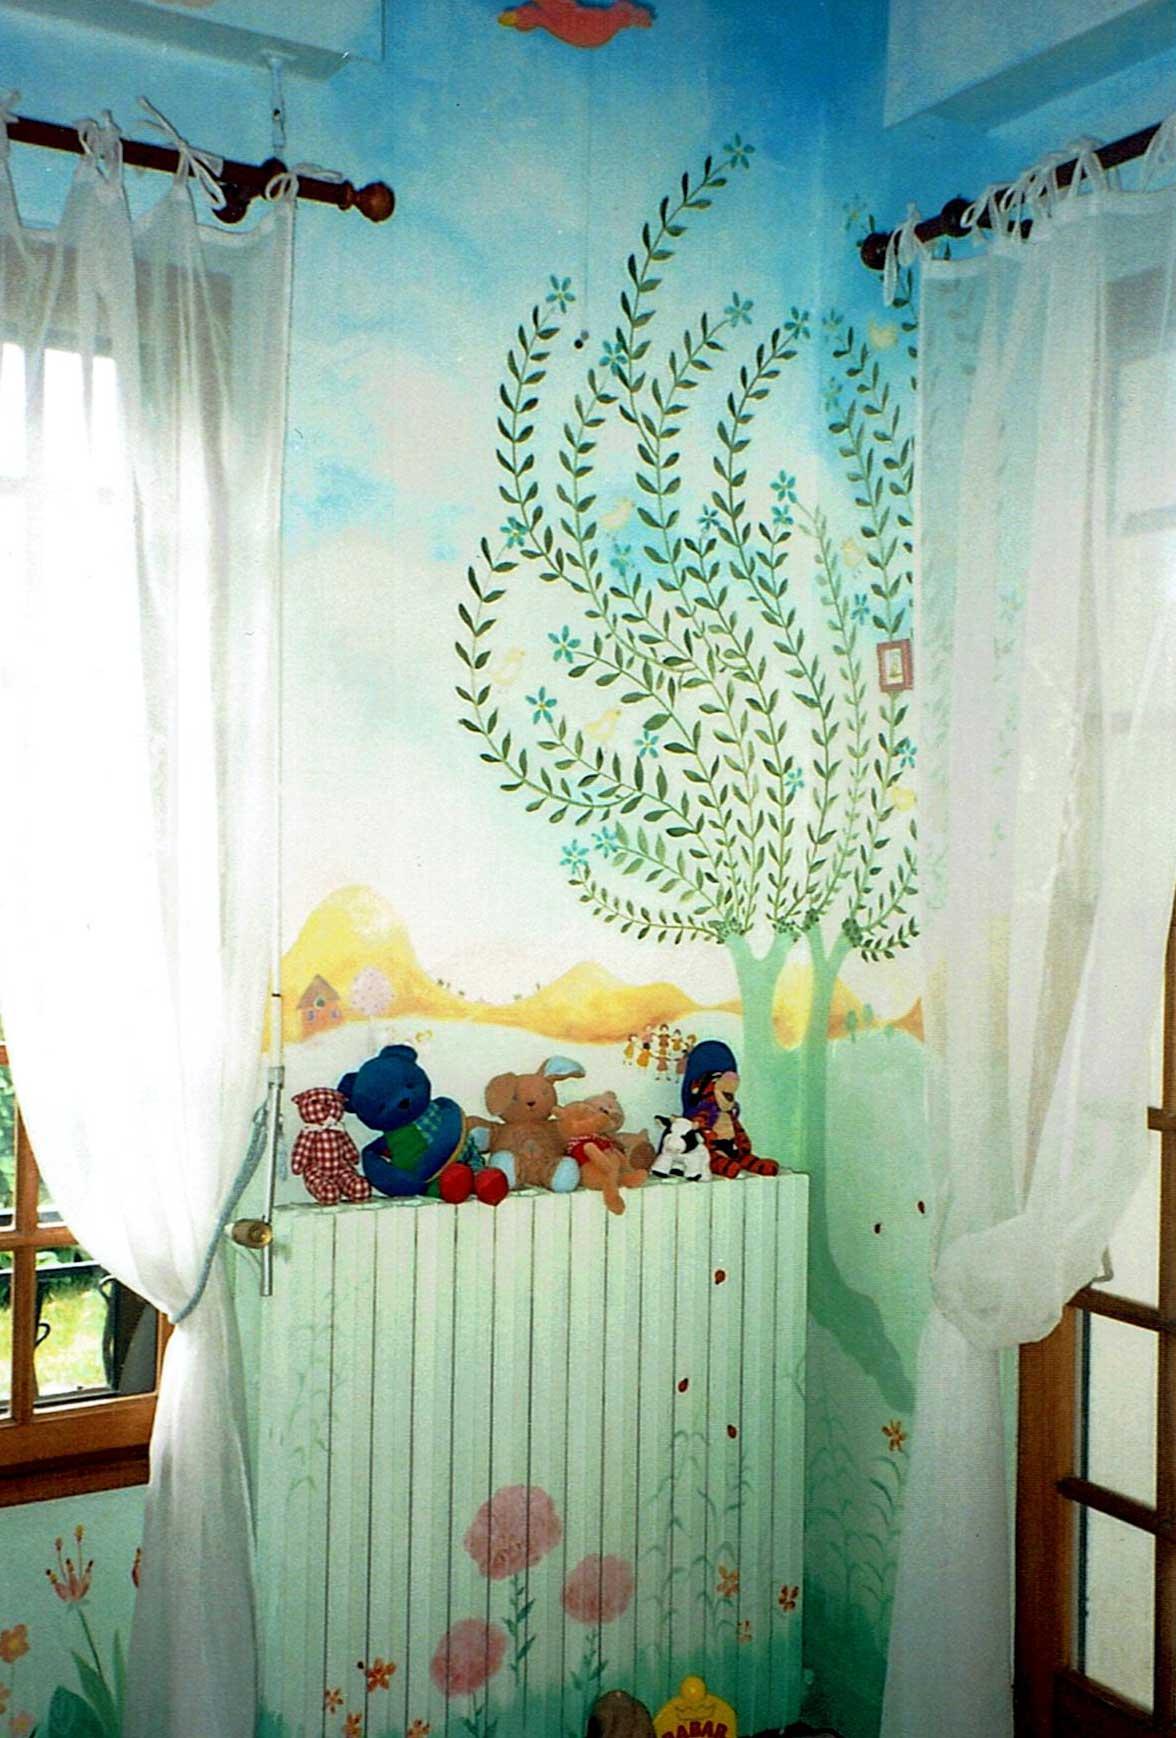 Peintures murales catherine ruszniewski for Peintures murales